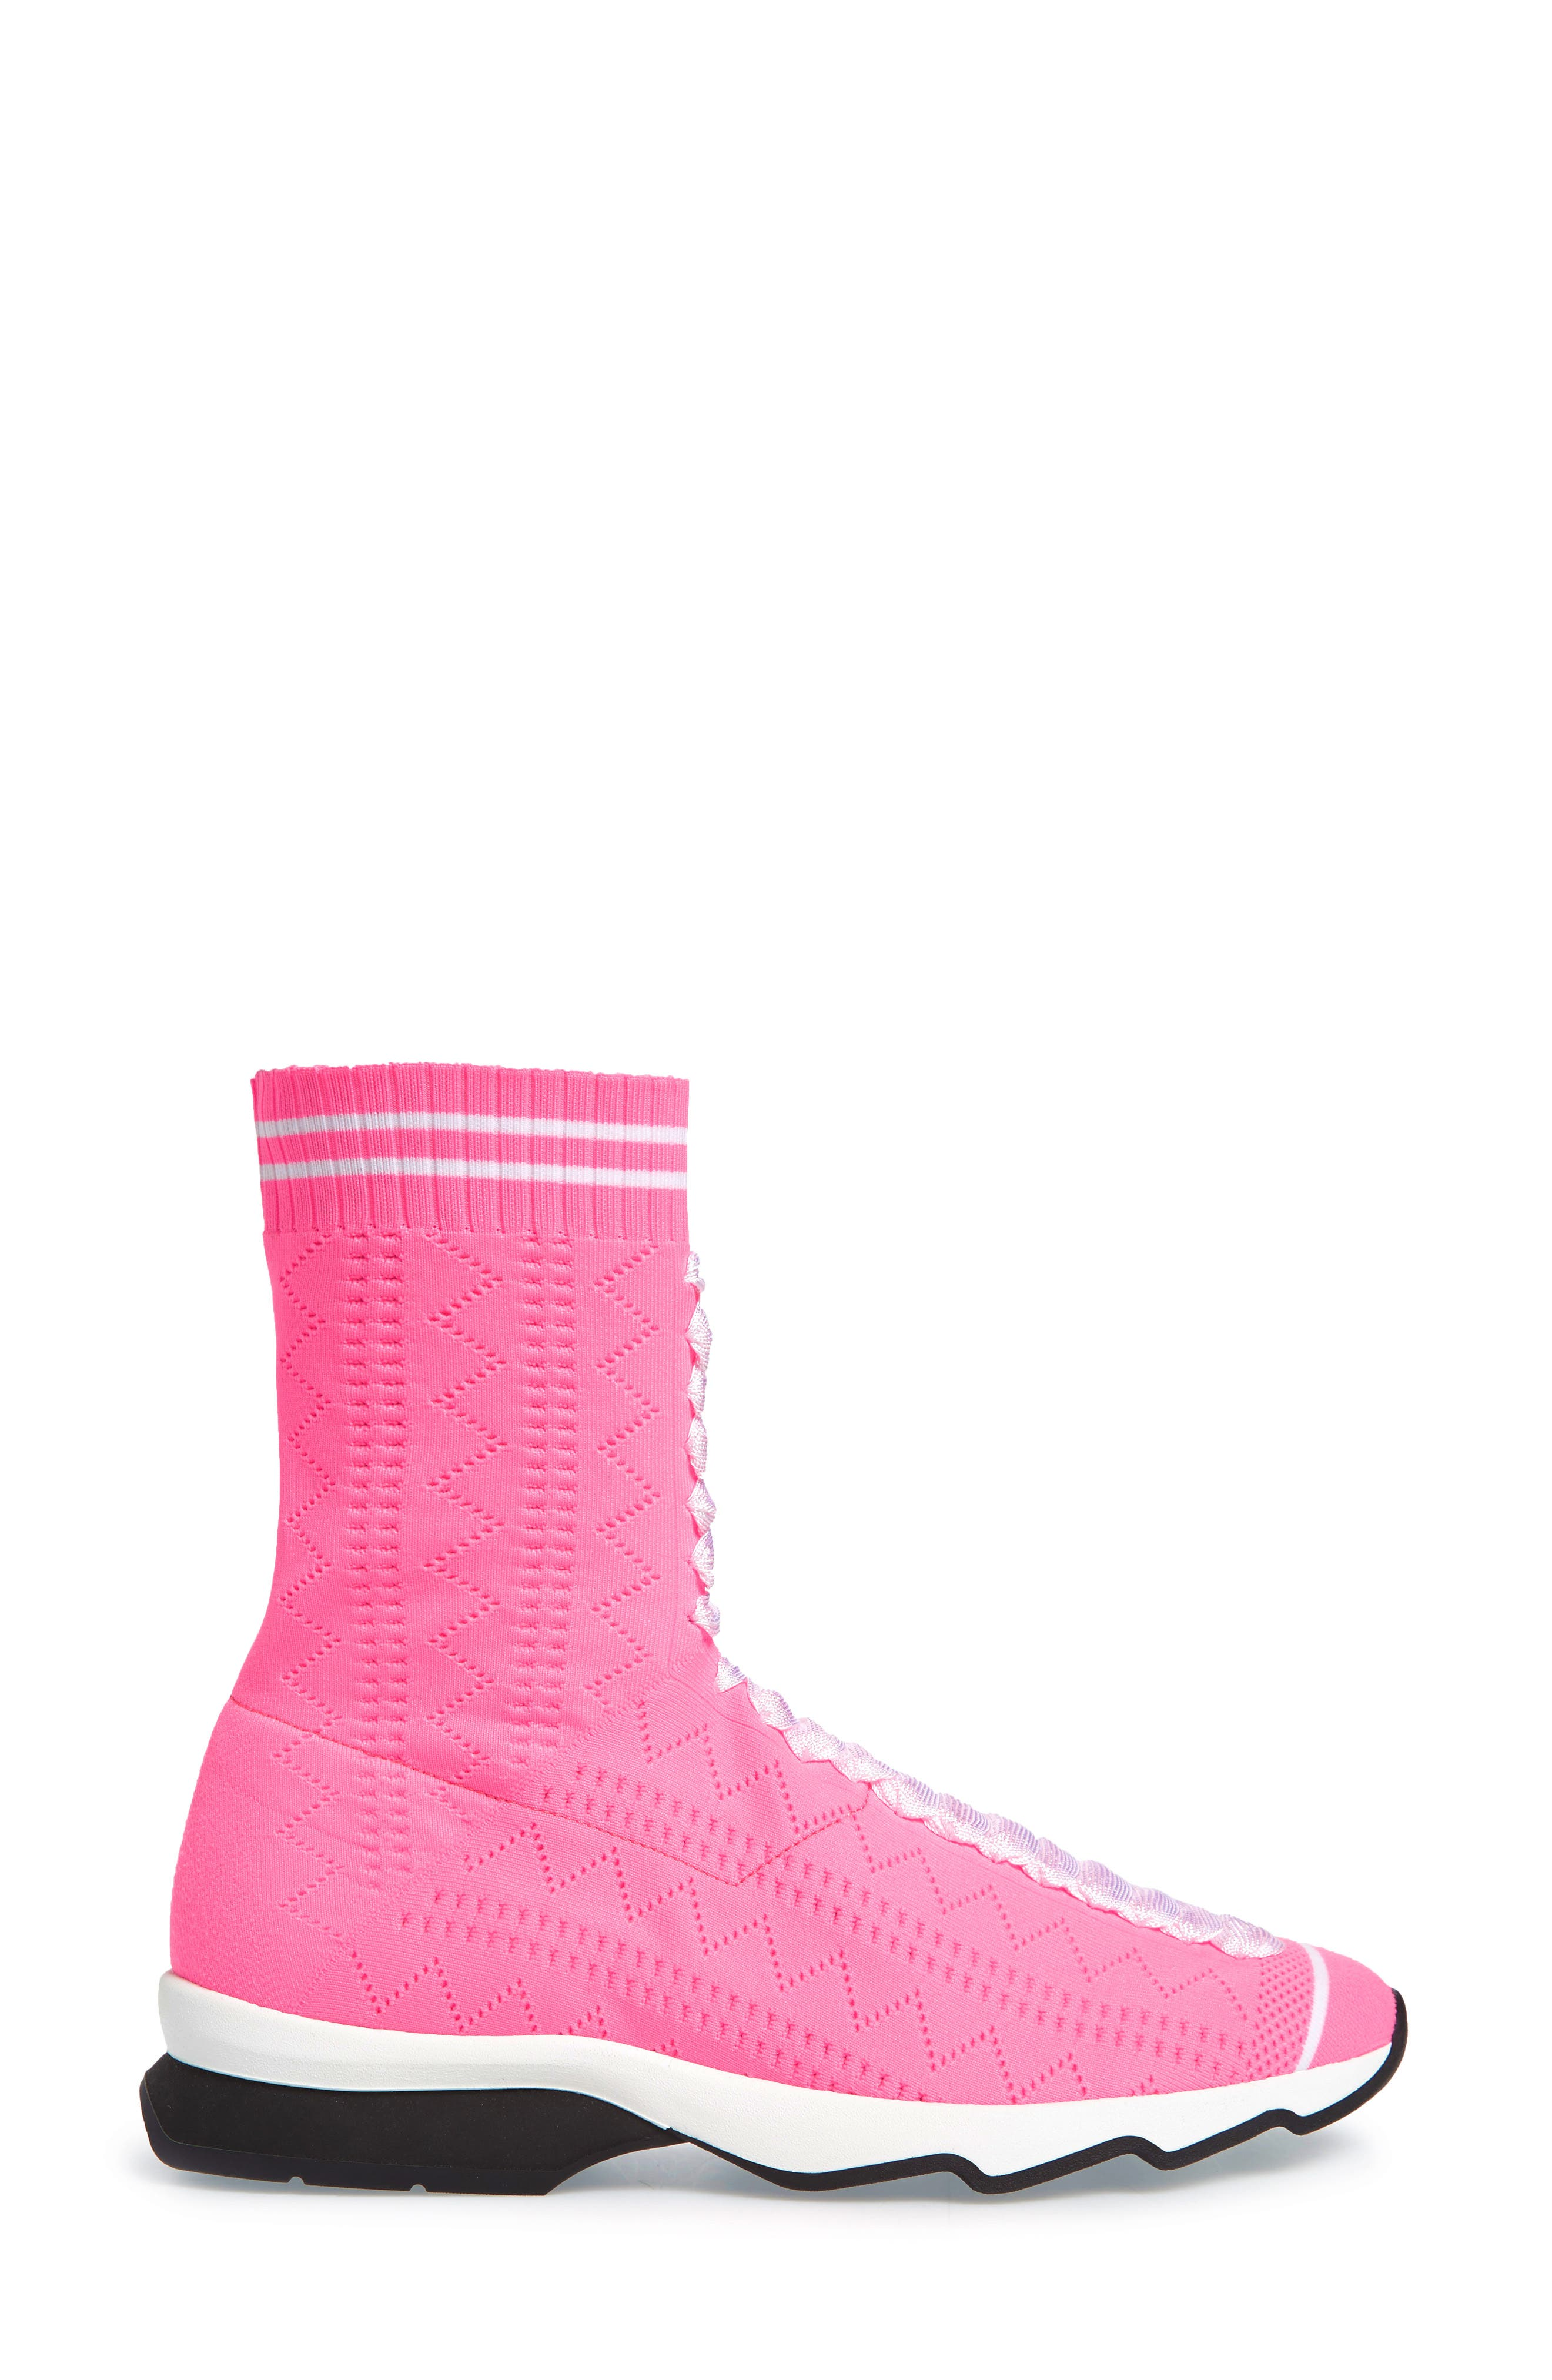 Rocko-Top Sock Sneaker,                             Alternate thumbnail 3, color,                             Pink